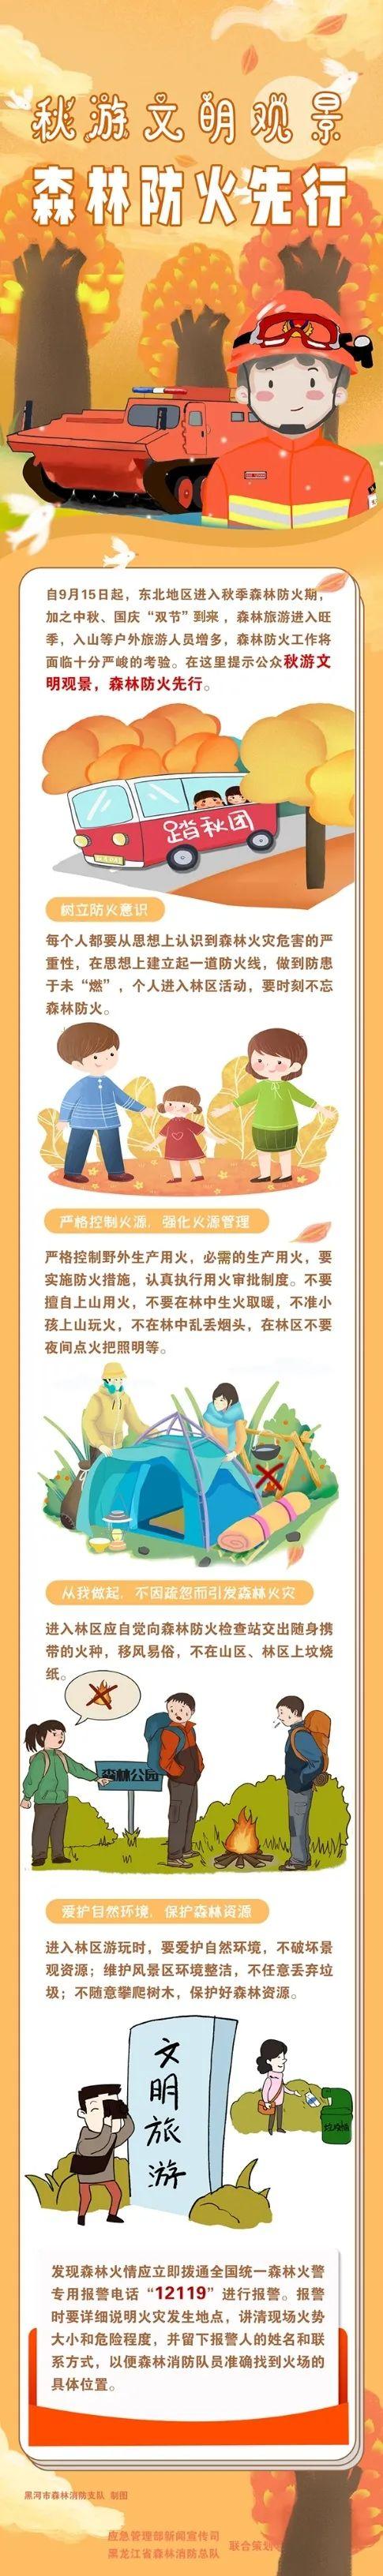 http://www.hinews.cn/news/pic/003/214/774/00321477481_1000525e.jpg